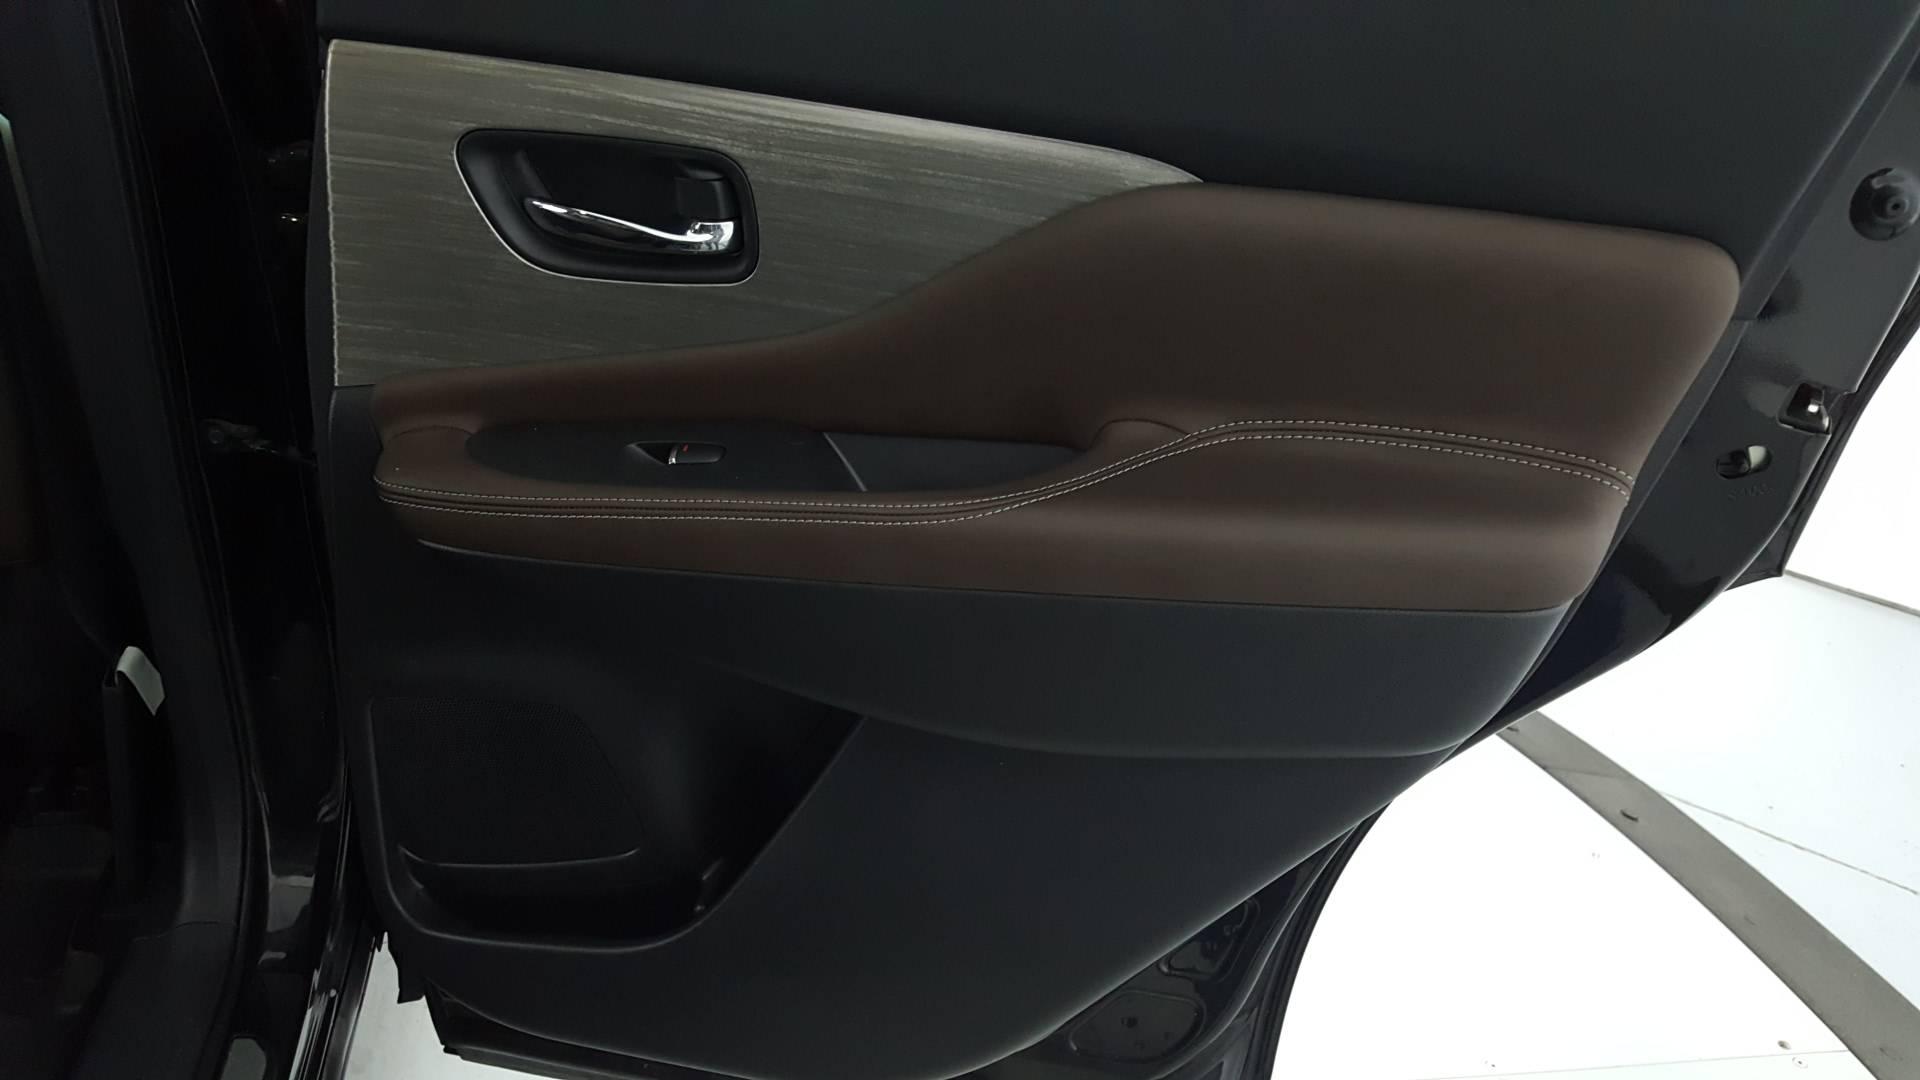 2015 Nissan Murano Sport Utility